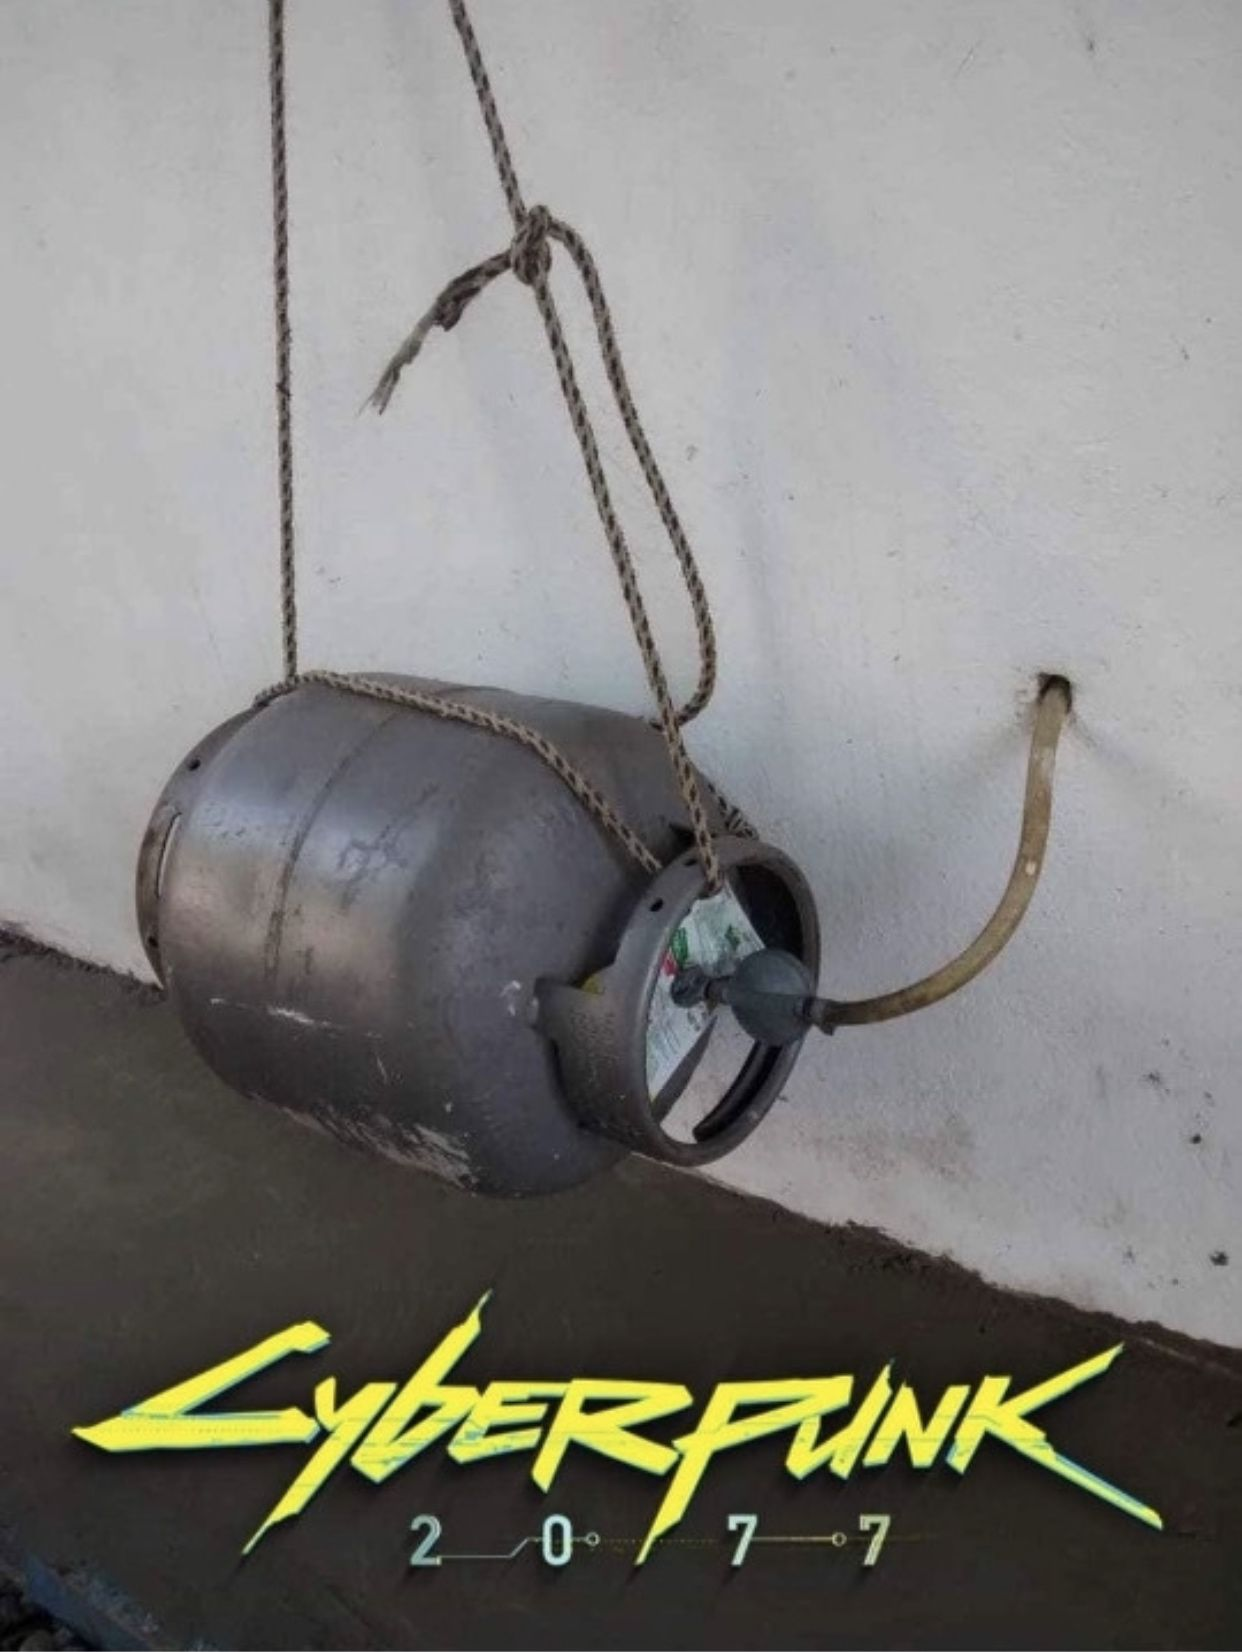 29 Cyberpunk 2077 Memes That Show People Using Technology